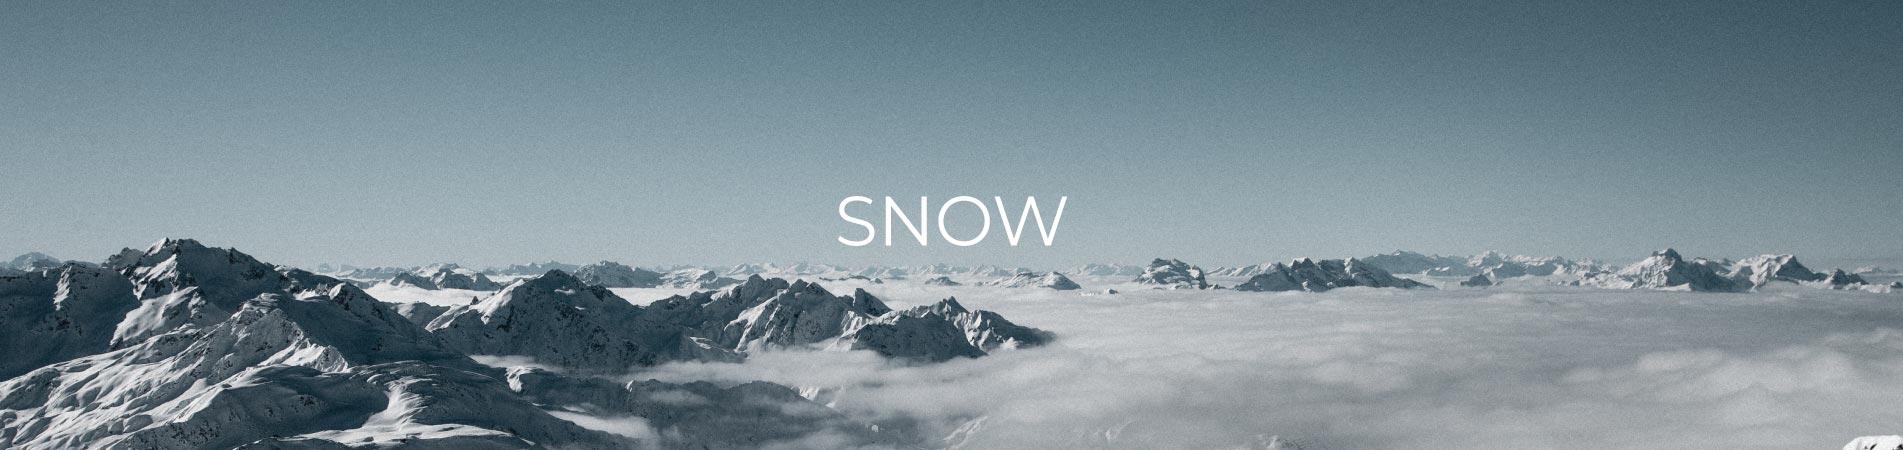 snow-banner.jpg